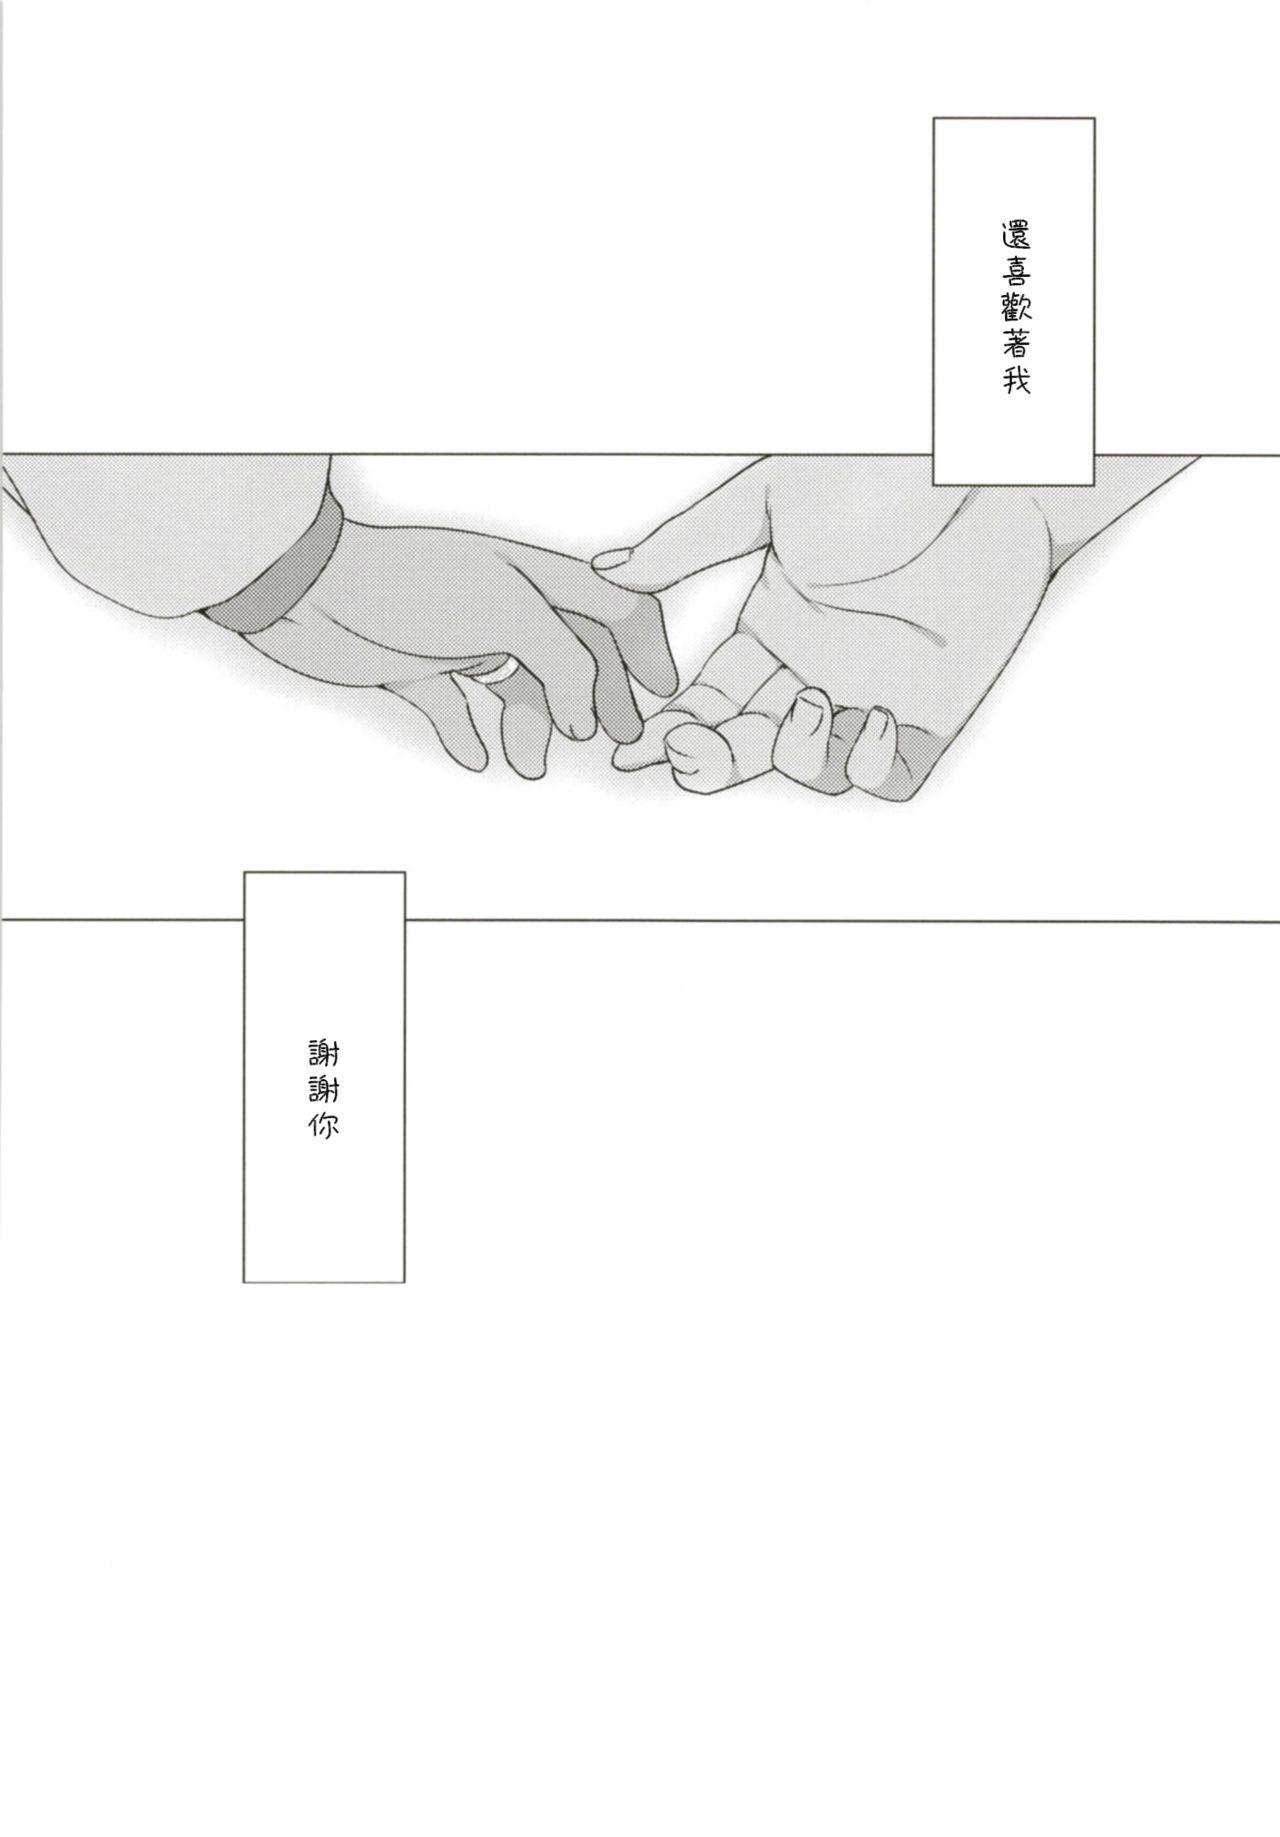 [French letter (Fujisaki Hikari)] Hitonatsu no Ayamachi -I-401 Soushuuhen- (Kantai Collection -KanColle-) [Chinese] [Digital] 85